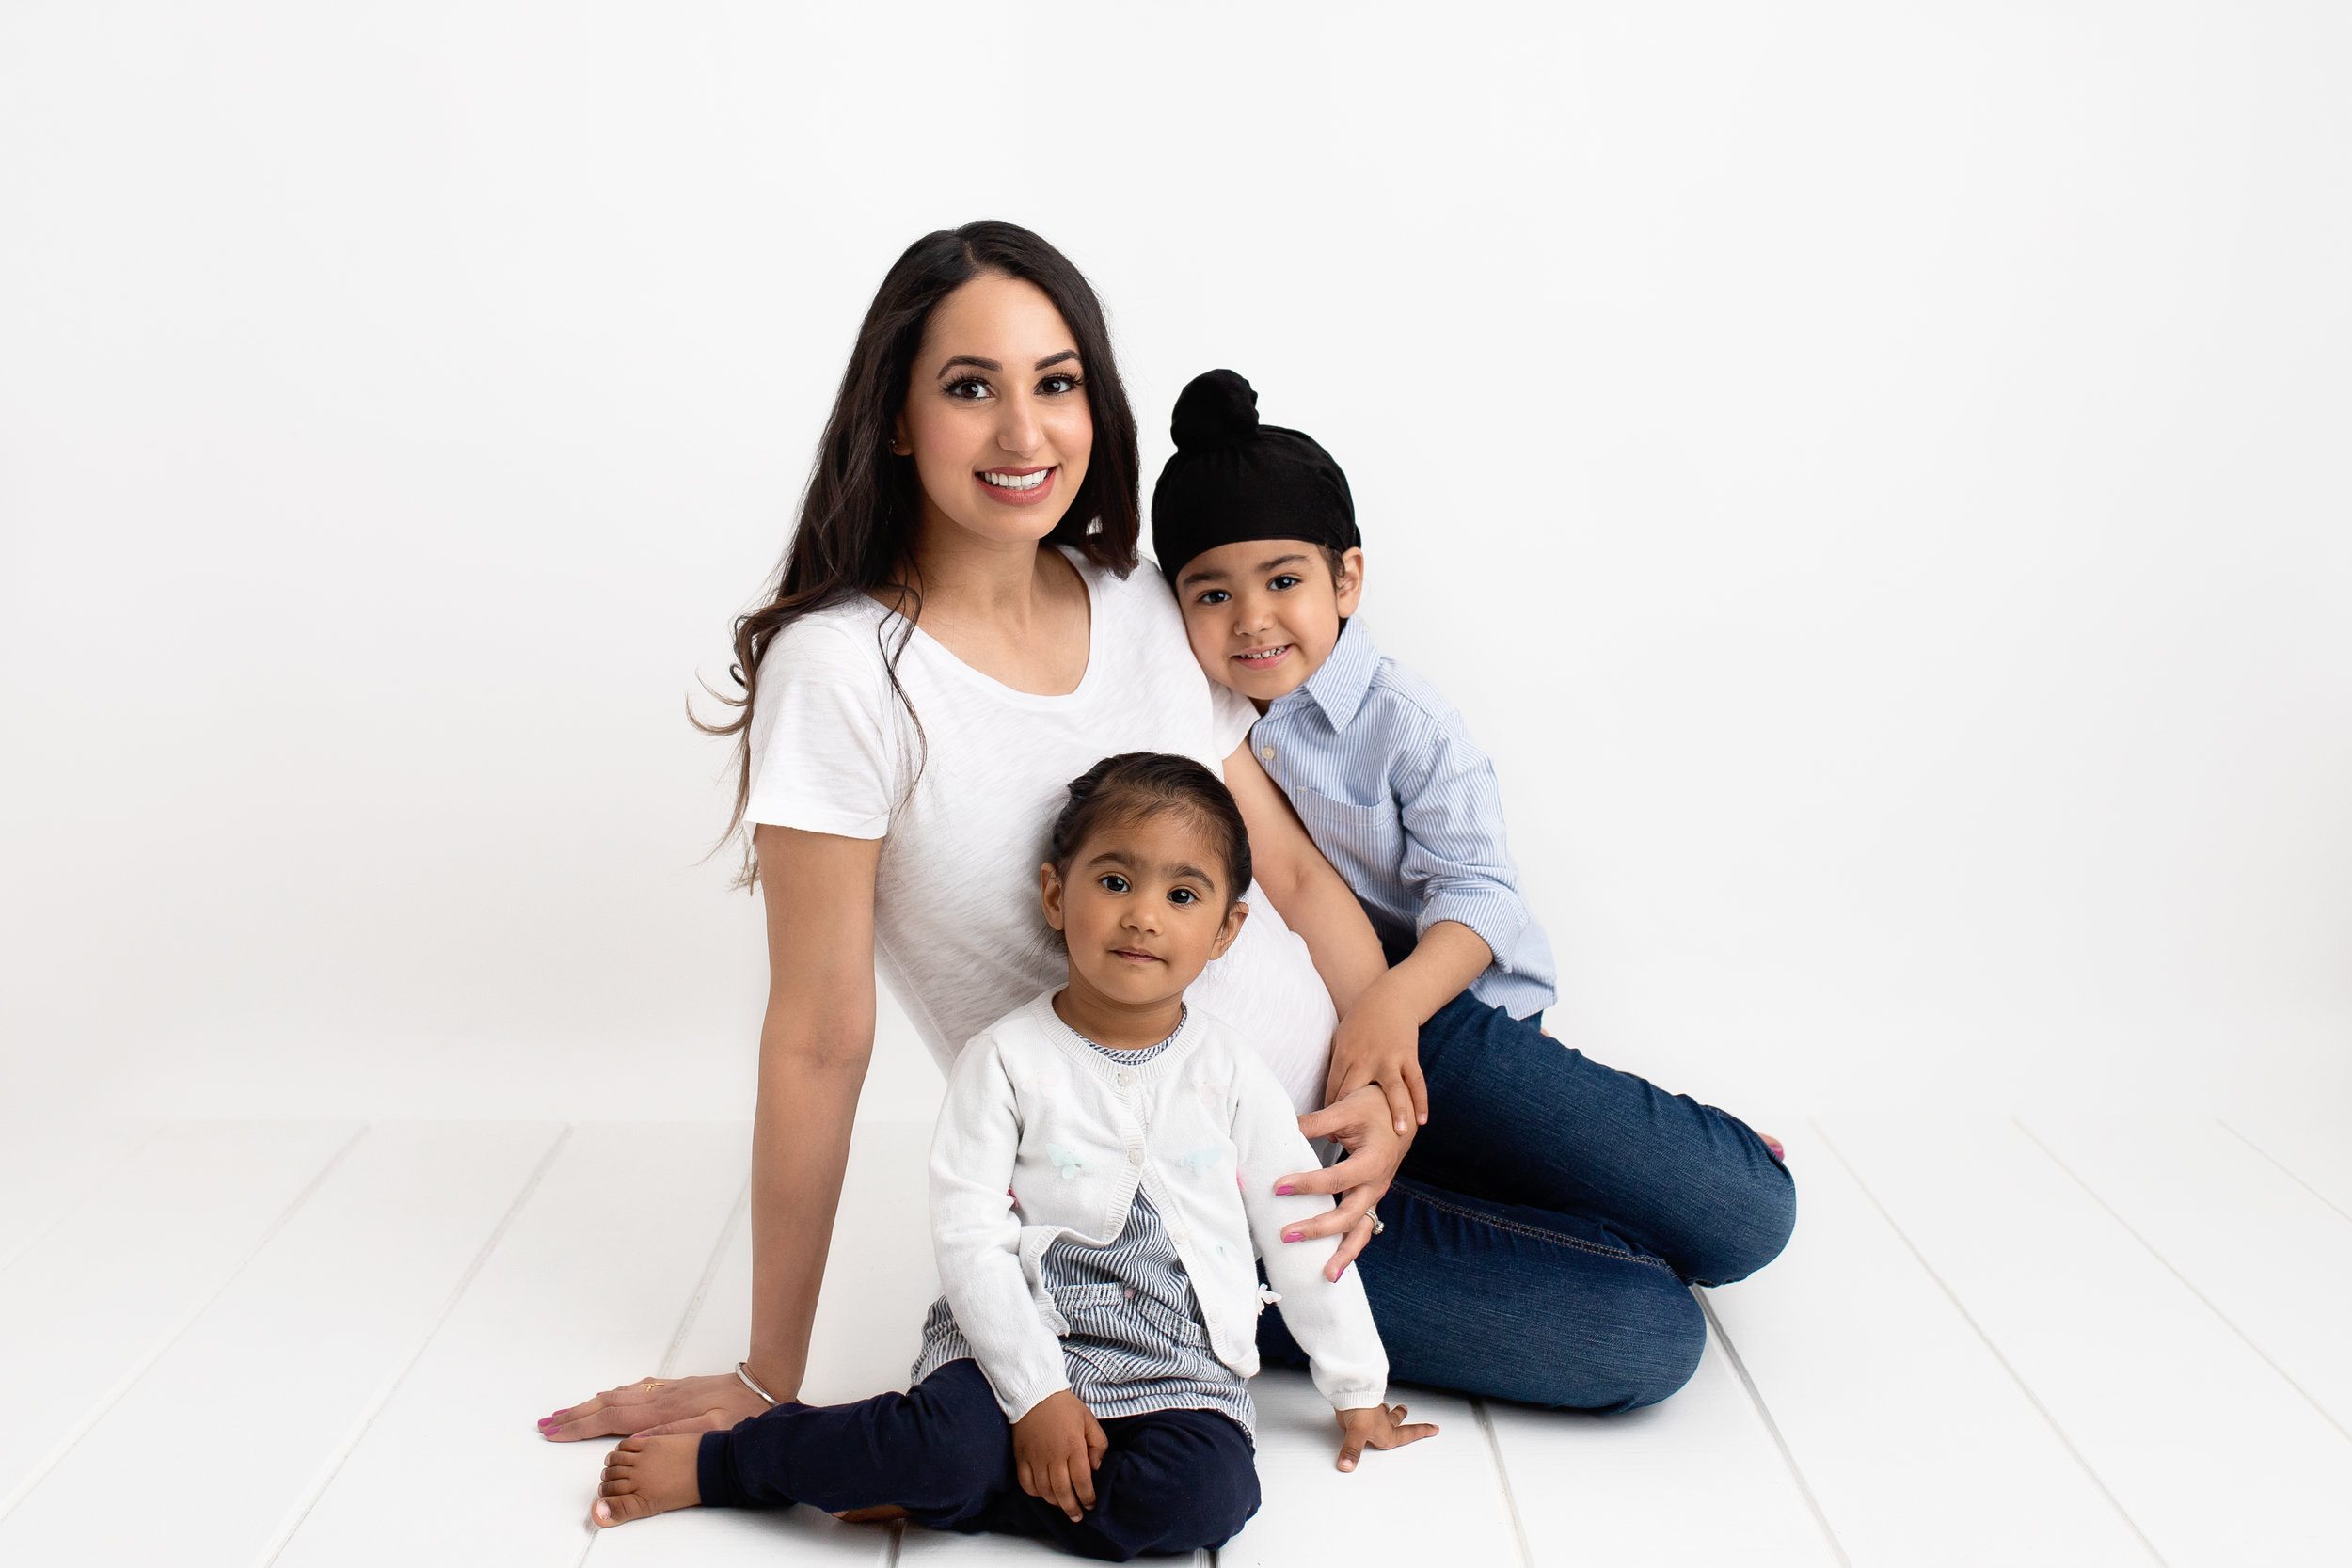 maternity photo session edmonton best photographer st-albert